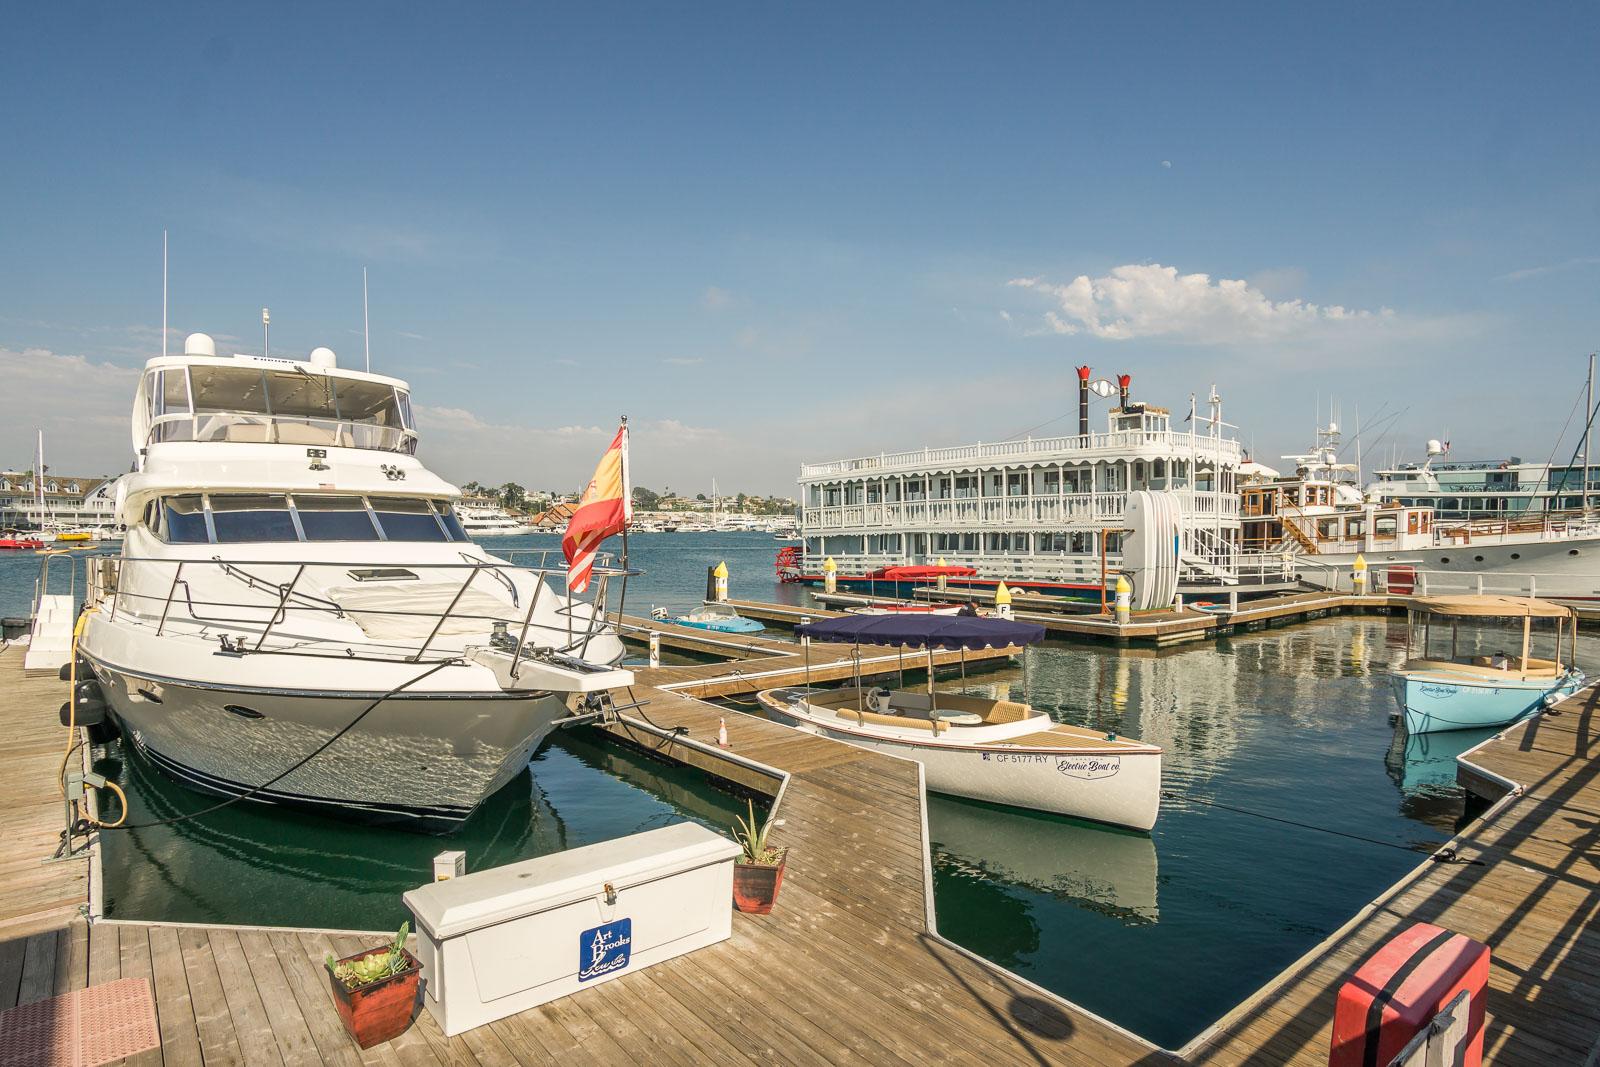 Lido Marina Harbor view  in Newport Beach from Nobu restaurant and Zinque restaurant